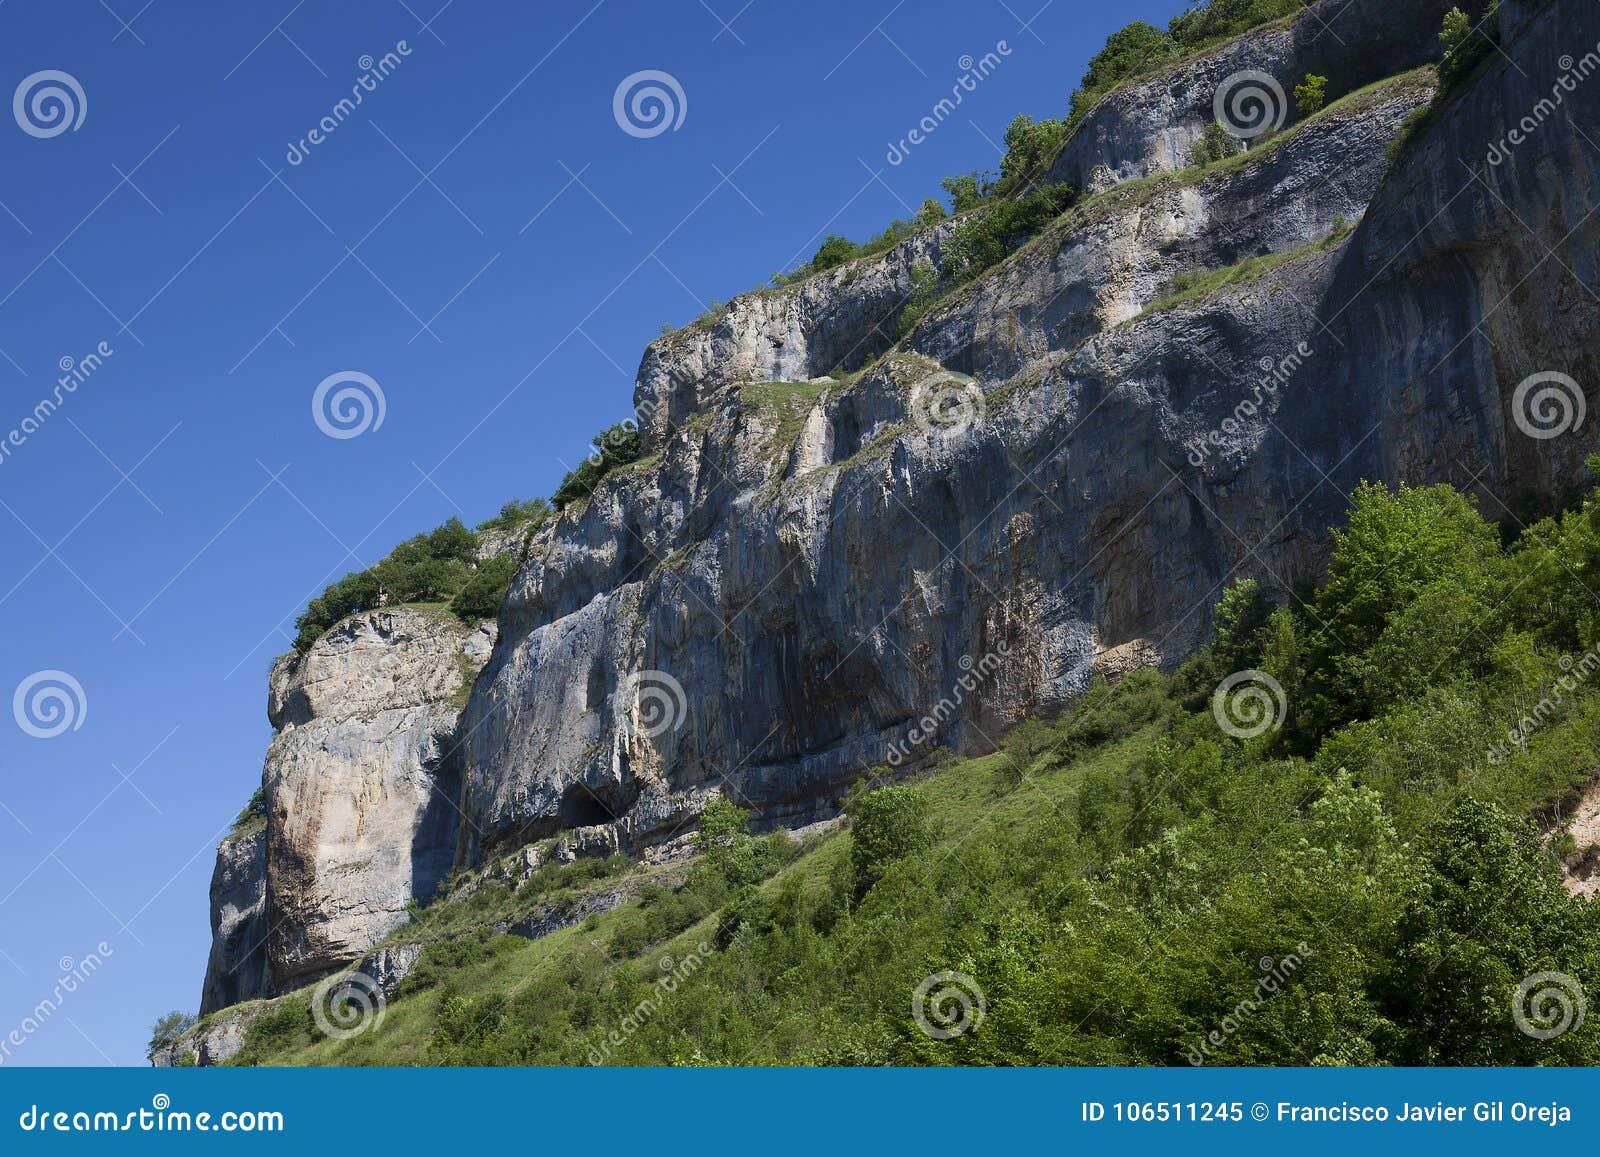 Cliffs of Baume-les-messieurs, Jura